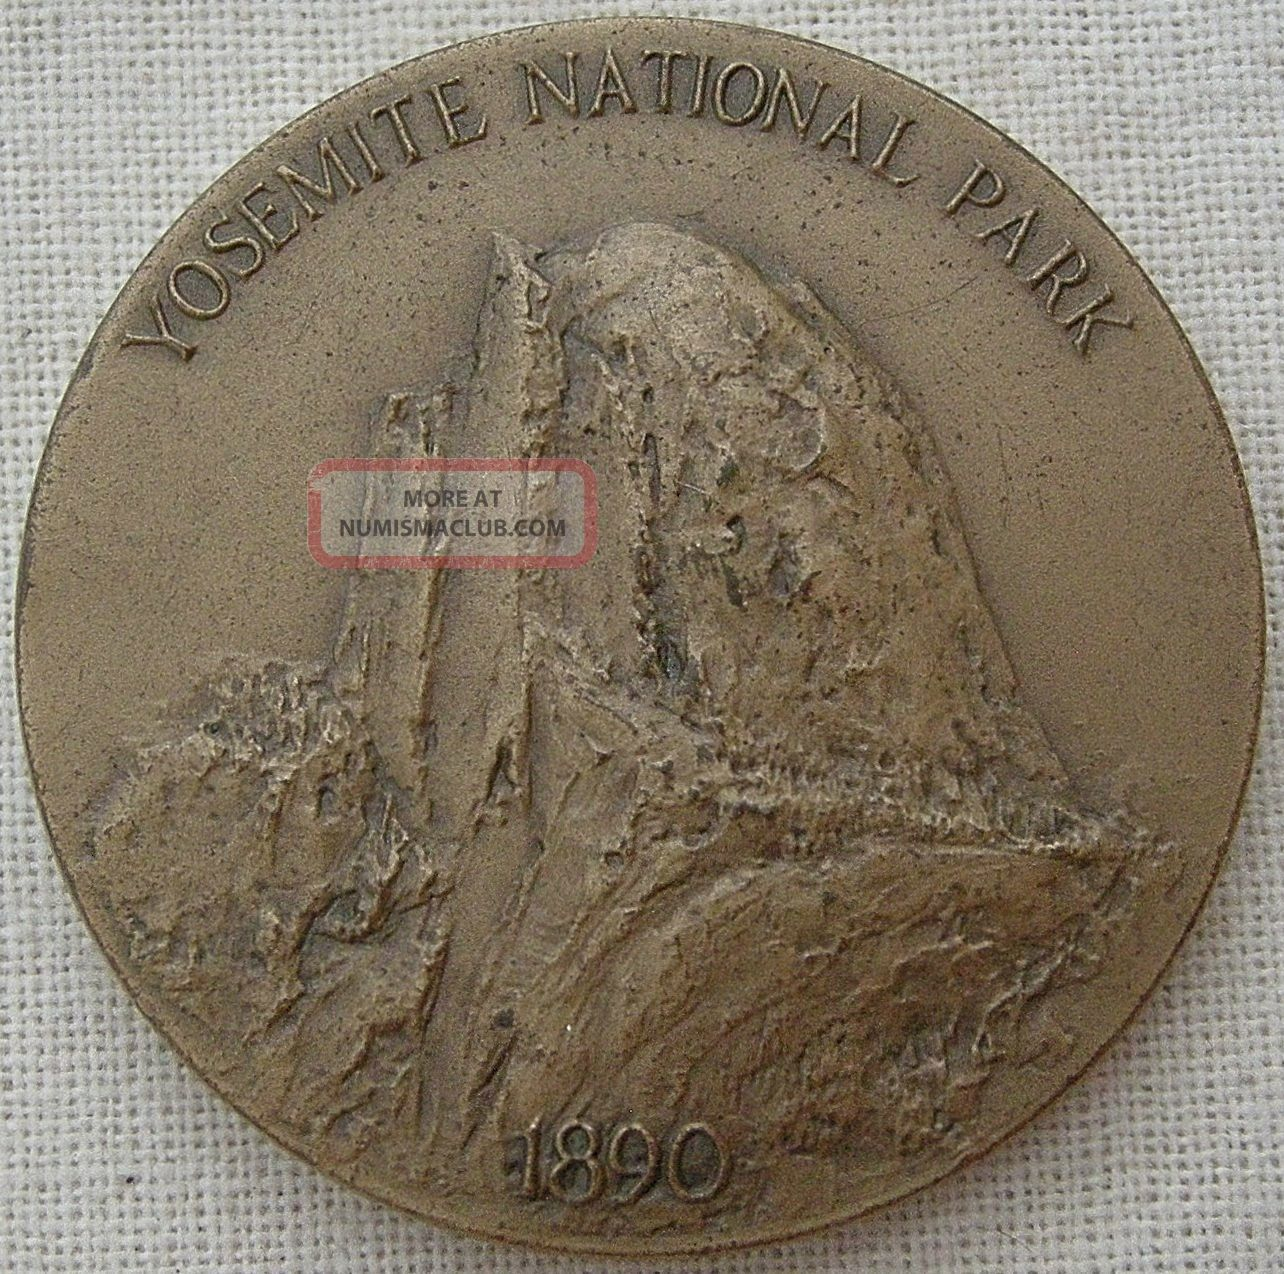 Maco.  National Parks Centennial,  Yosemite Medal,  1972 By Frank Hagel Exonumia photo